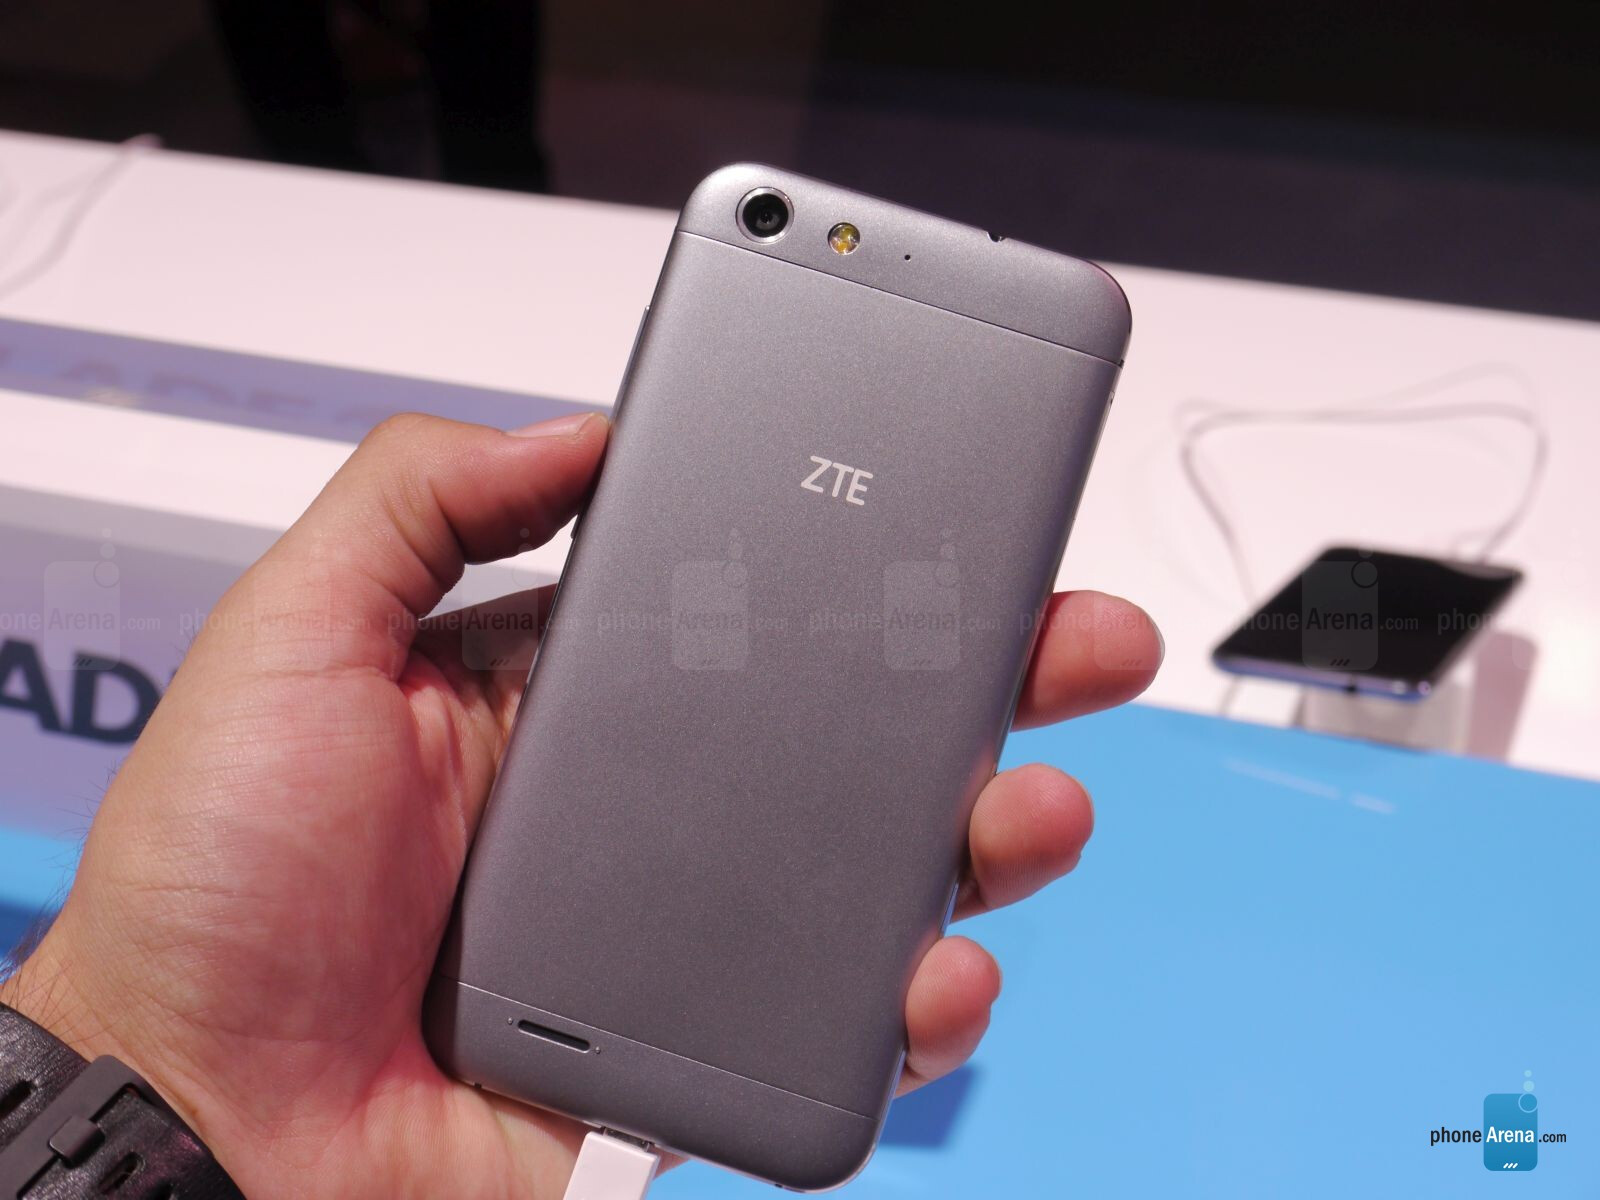 zte v6 y iphone 6 similar